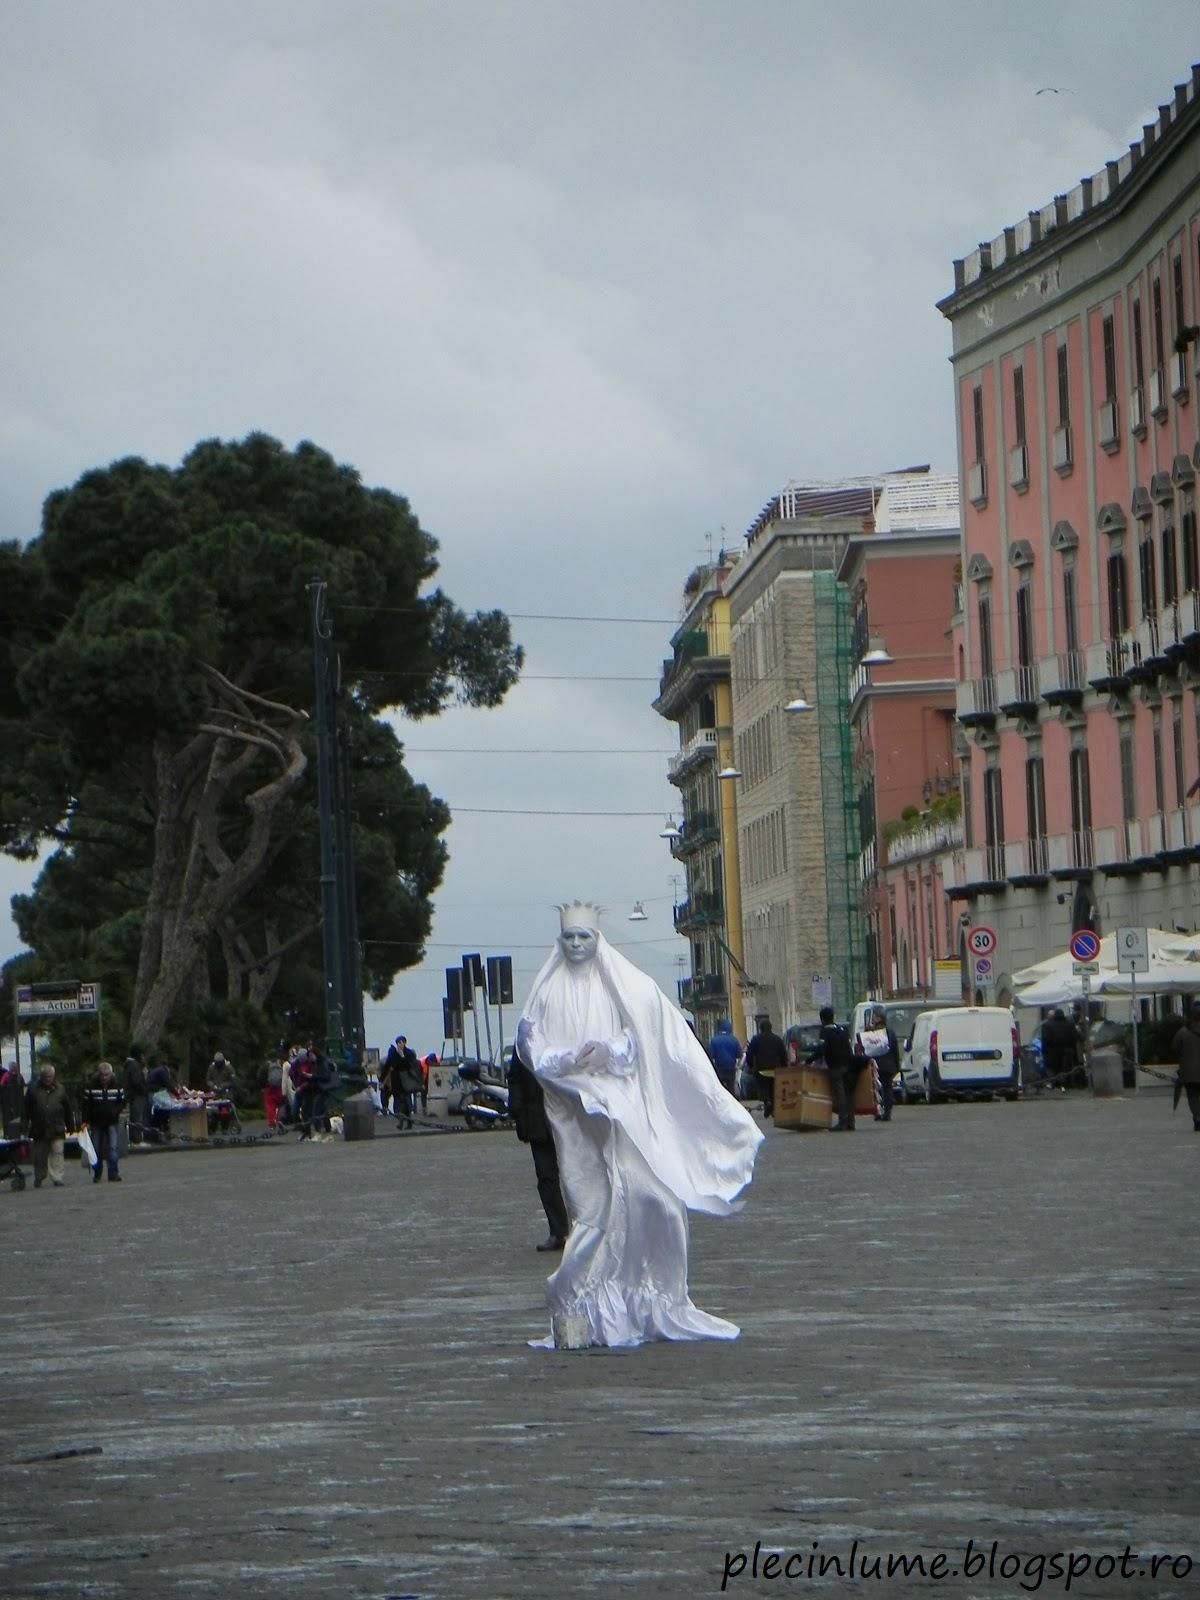 Statuie umana in Piazza Plebiscito